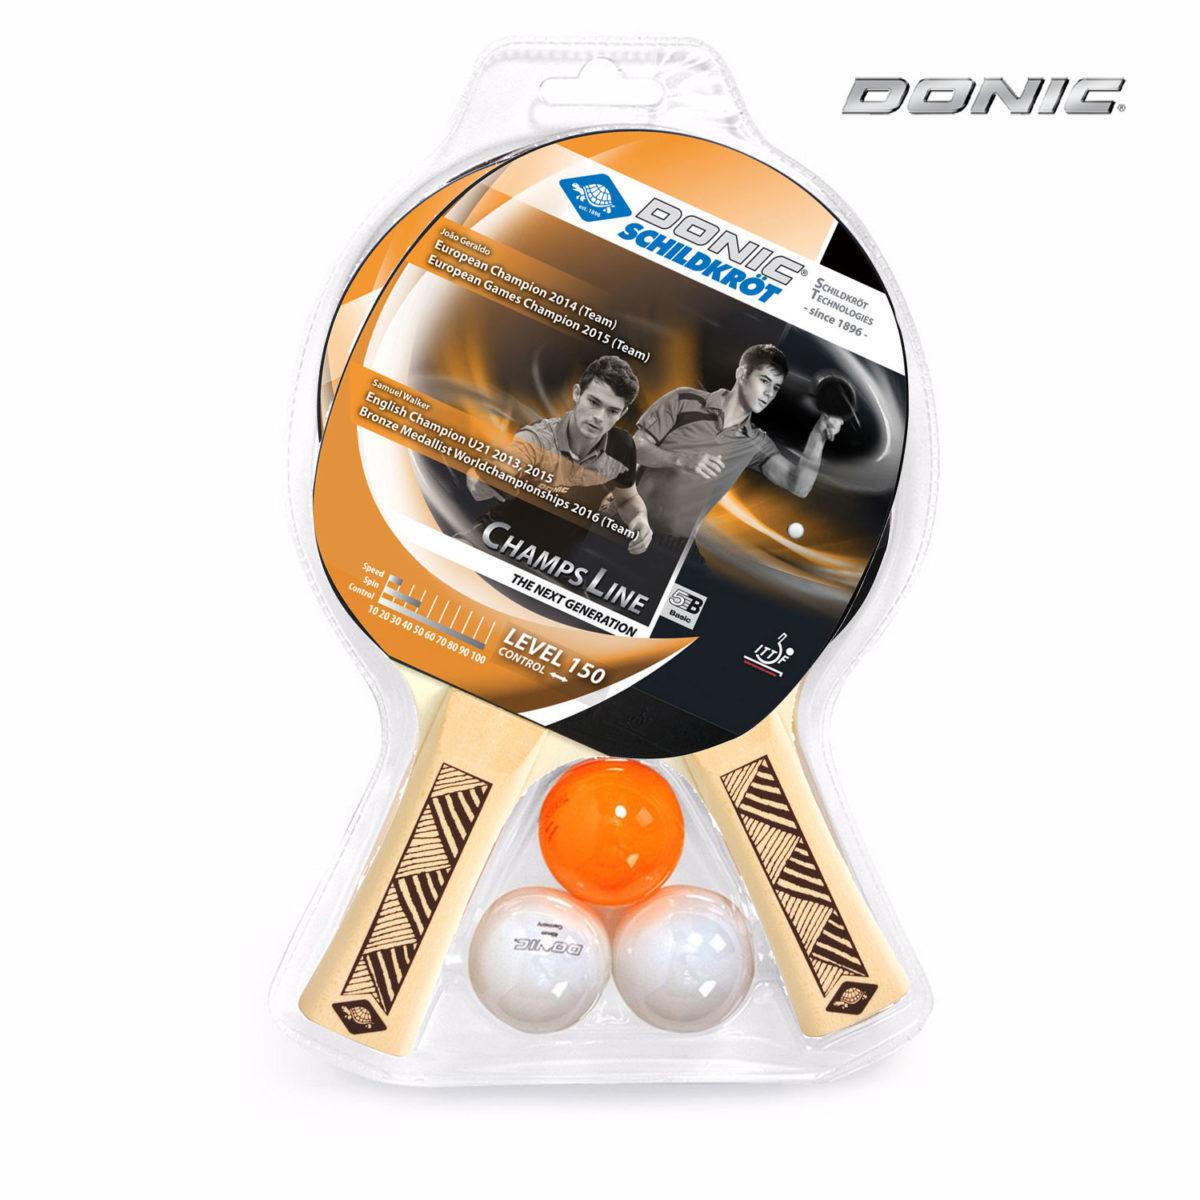 DONIC Champs 150 набор для настольного тенниса - 1